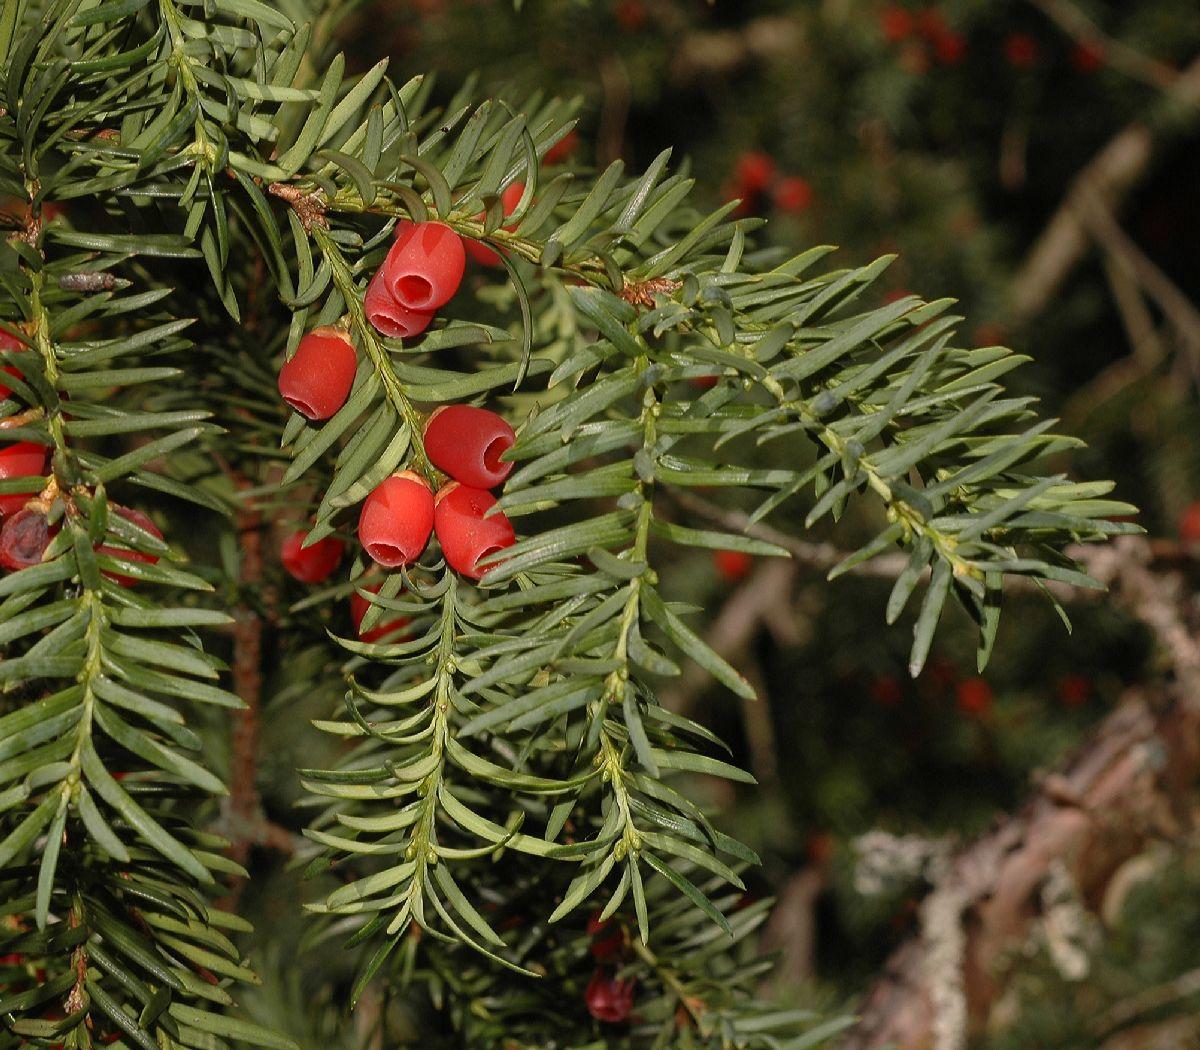 Plantsnap – Identify Plants, Trees, Mushrooms With An App